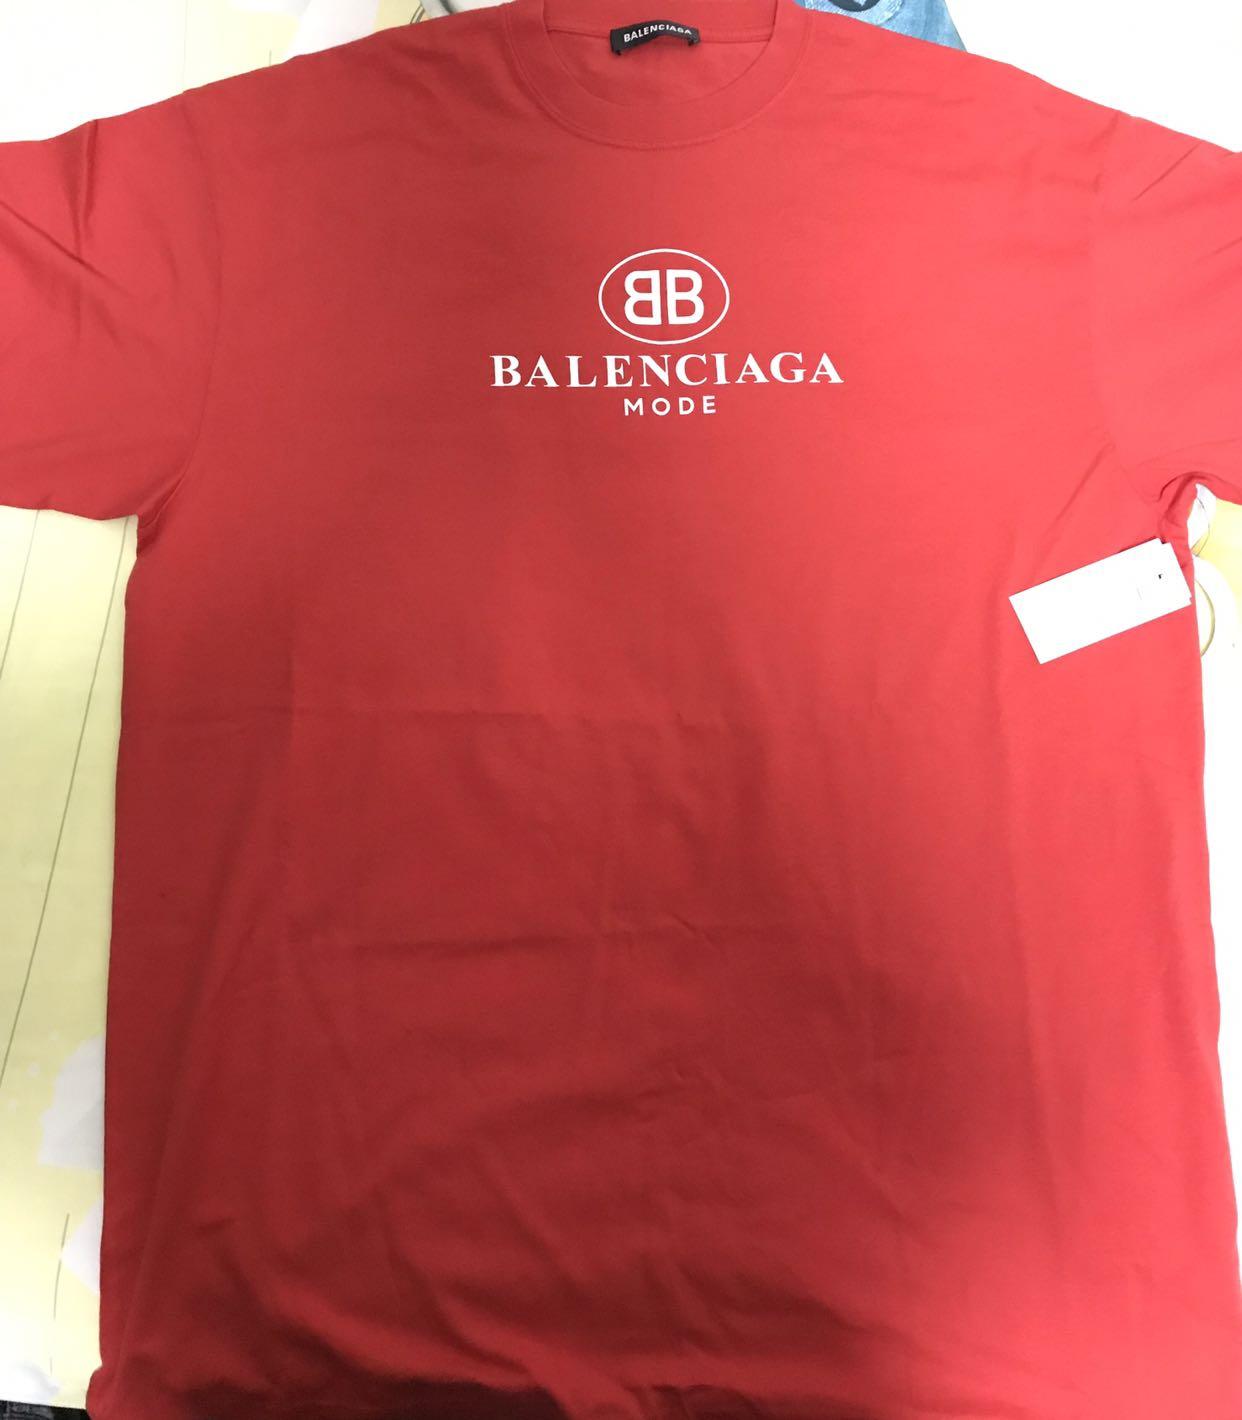 74191e917e8f STEAL> Balenciaga BB Mode Red T-shirt, Men's Fashion, Clothes, Tops ...